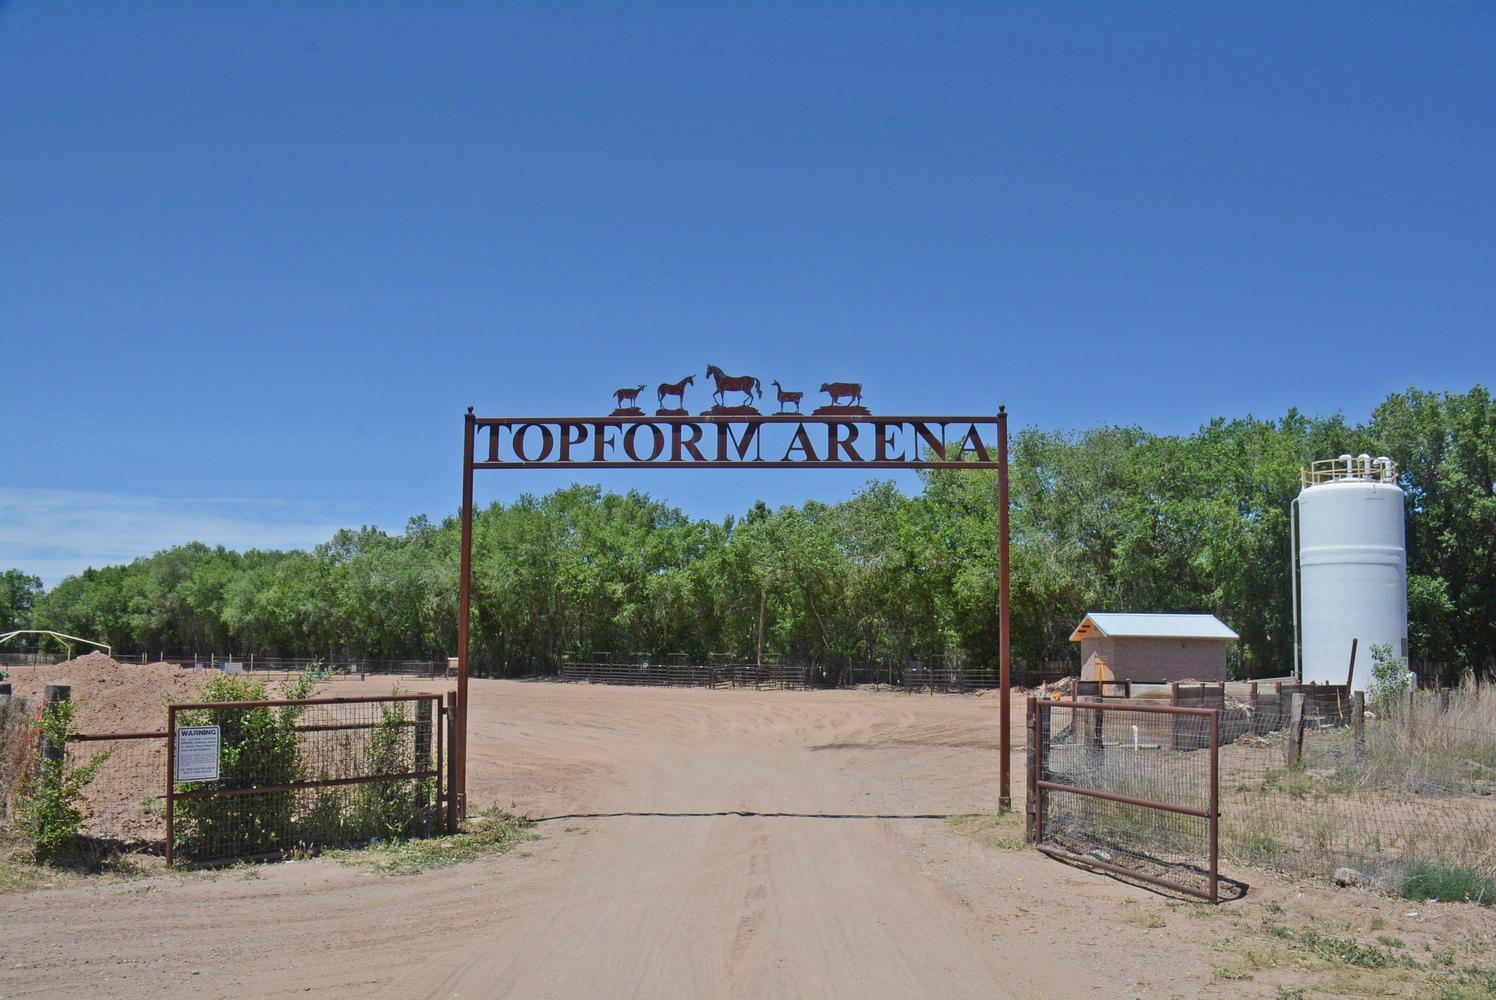 Top Form Arena